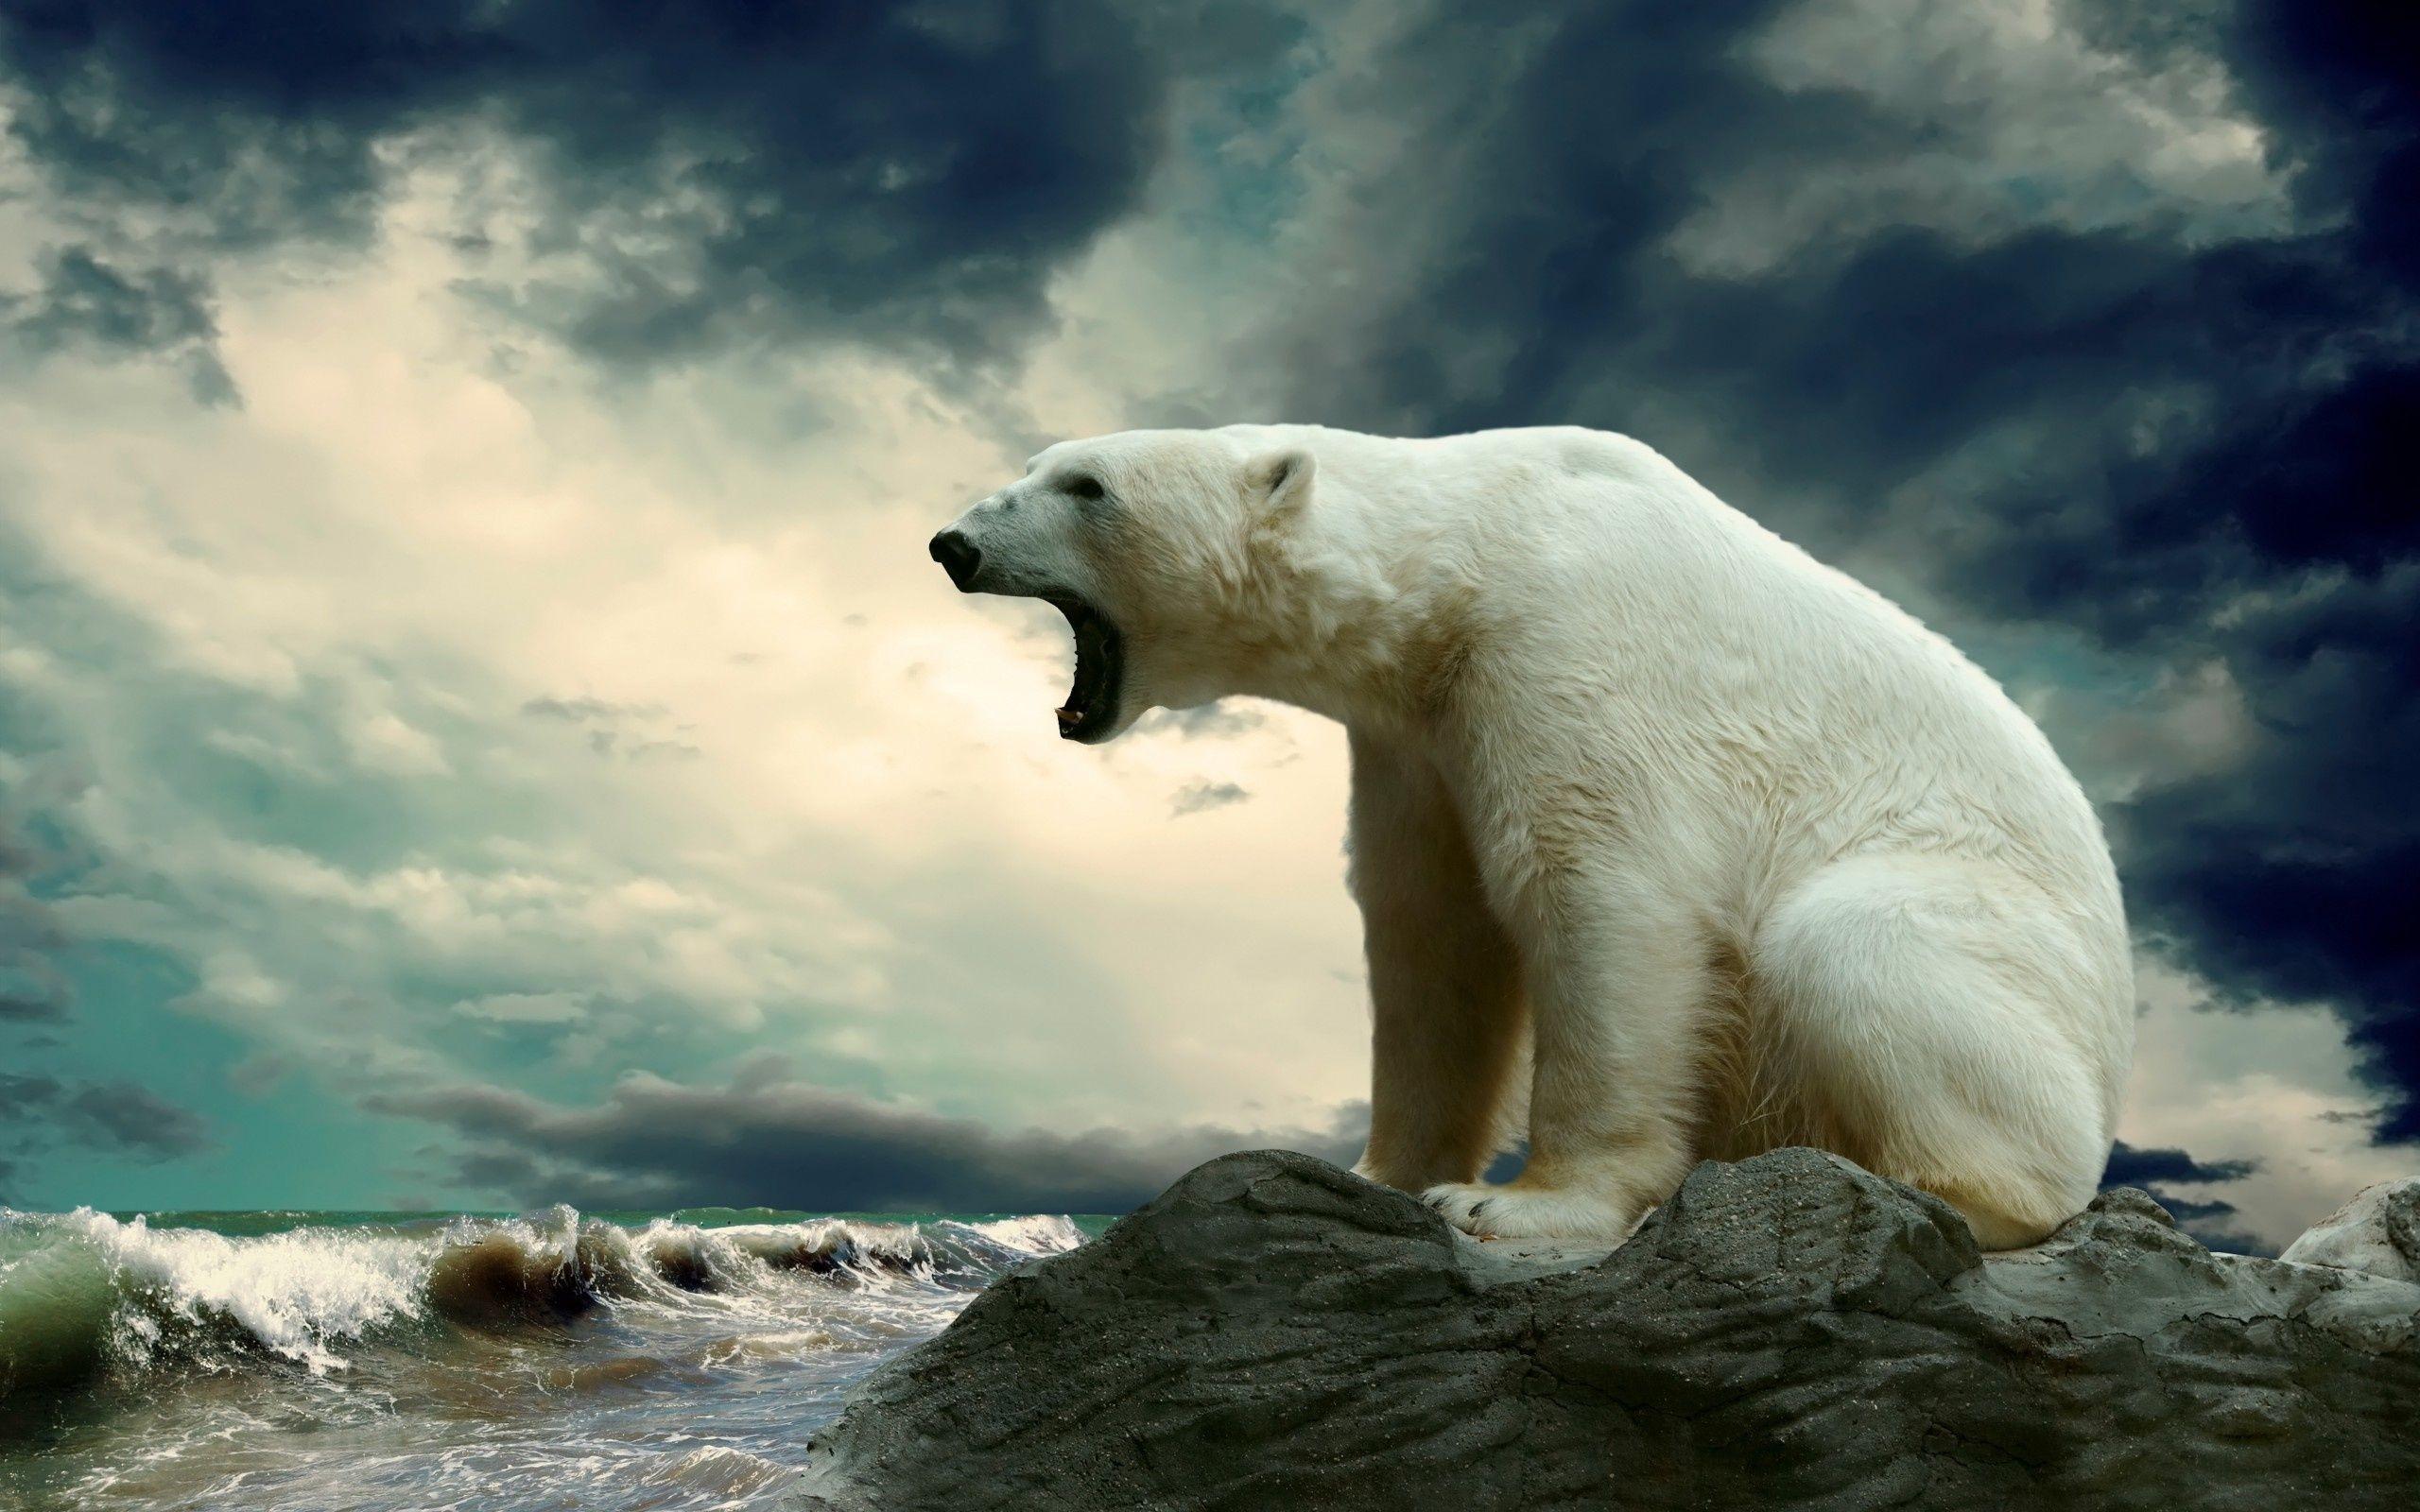 Bear Wallpaper Mobile | Animals Wallpapers | Pinterest | Bear wallpaper,  Wallpaper and Animation